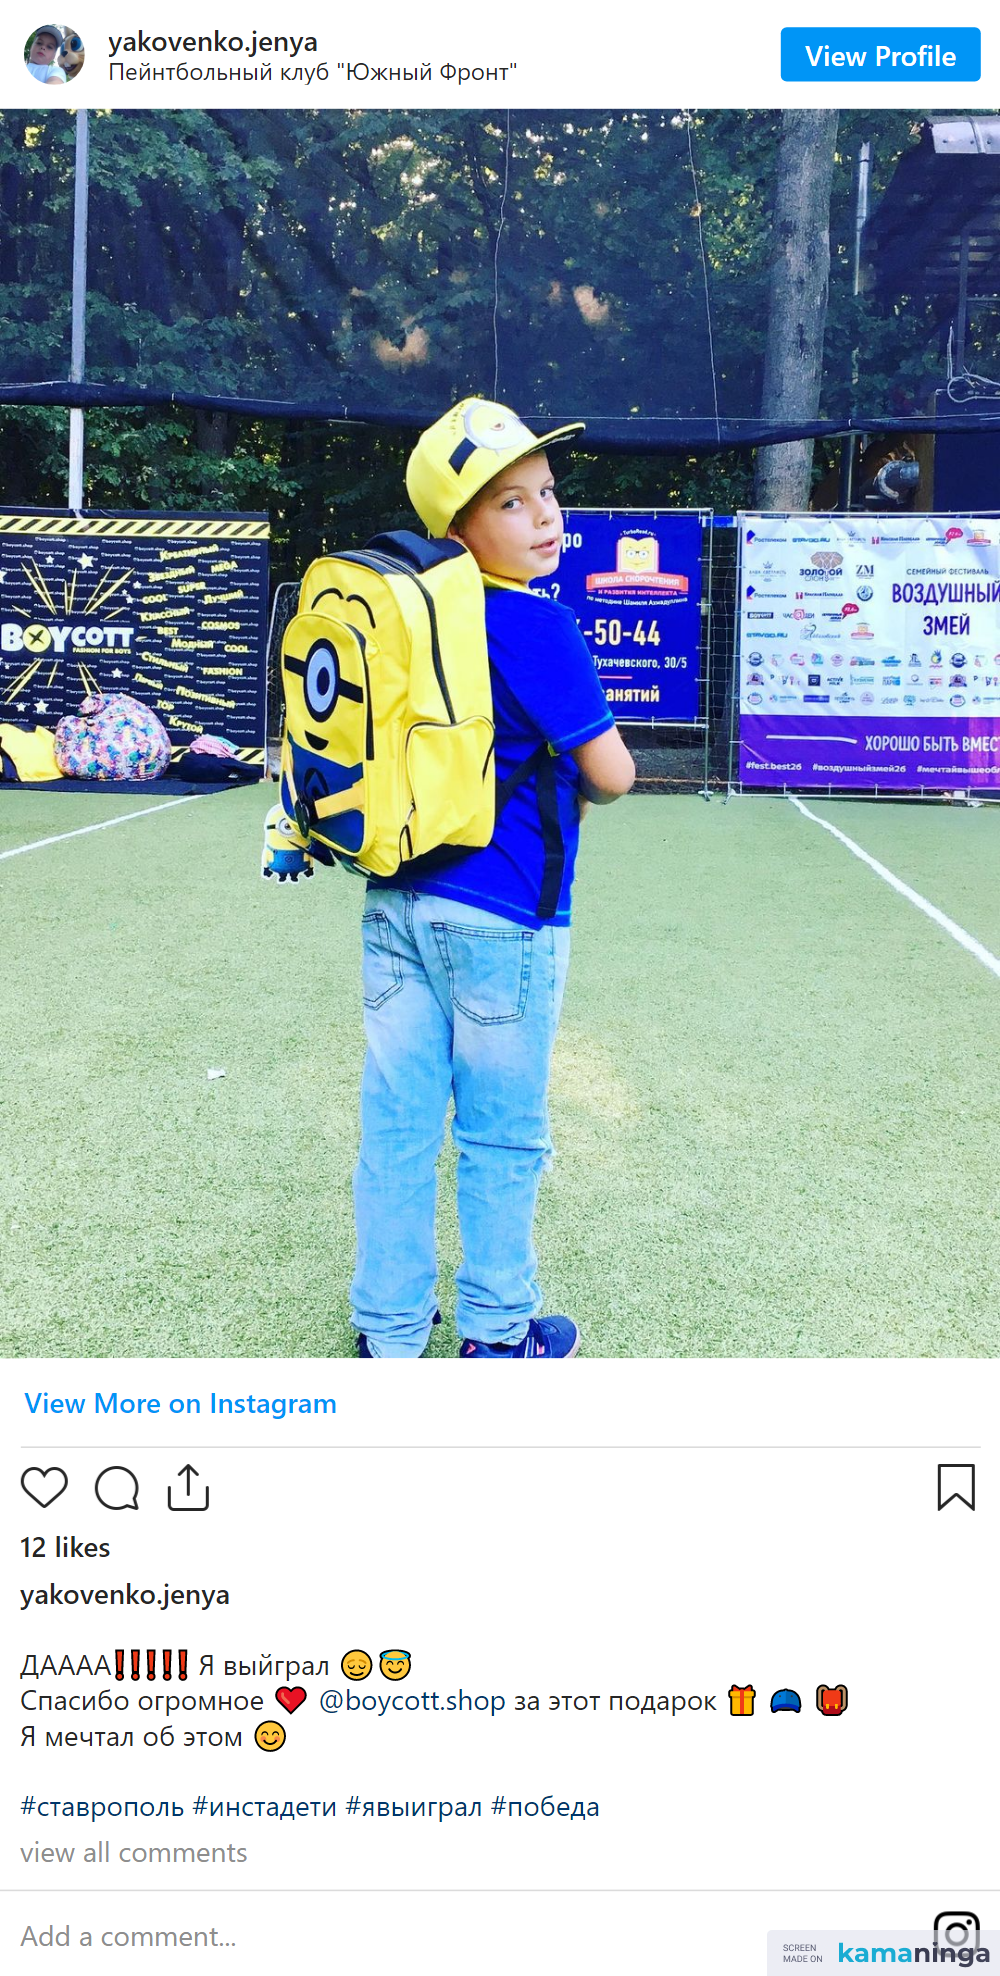 https://www.instagram.com/p/B11LV8AJ1nV/